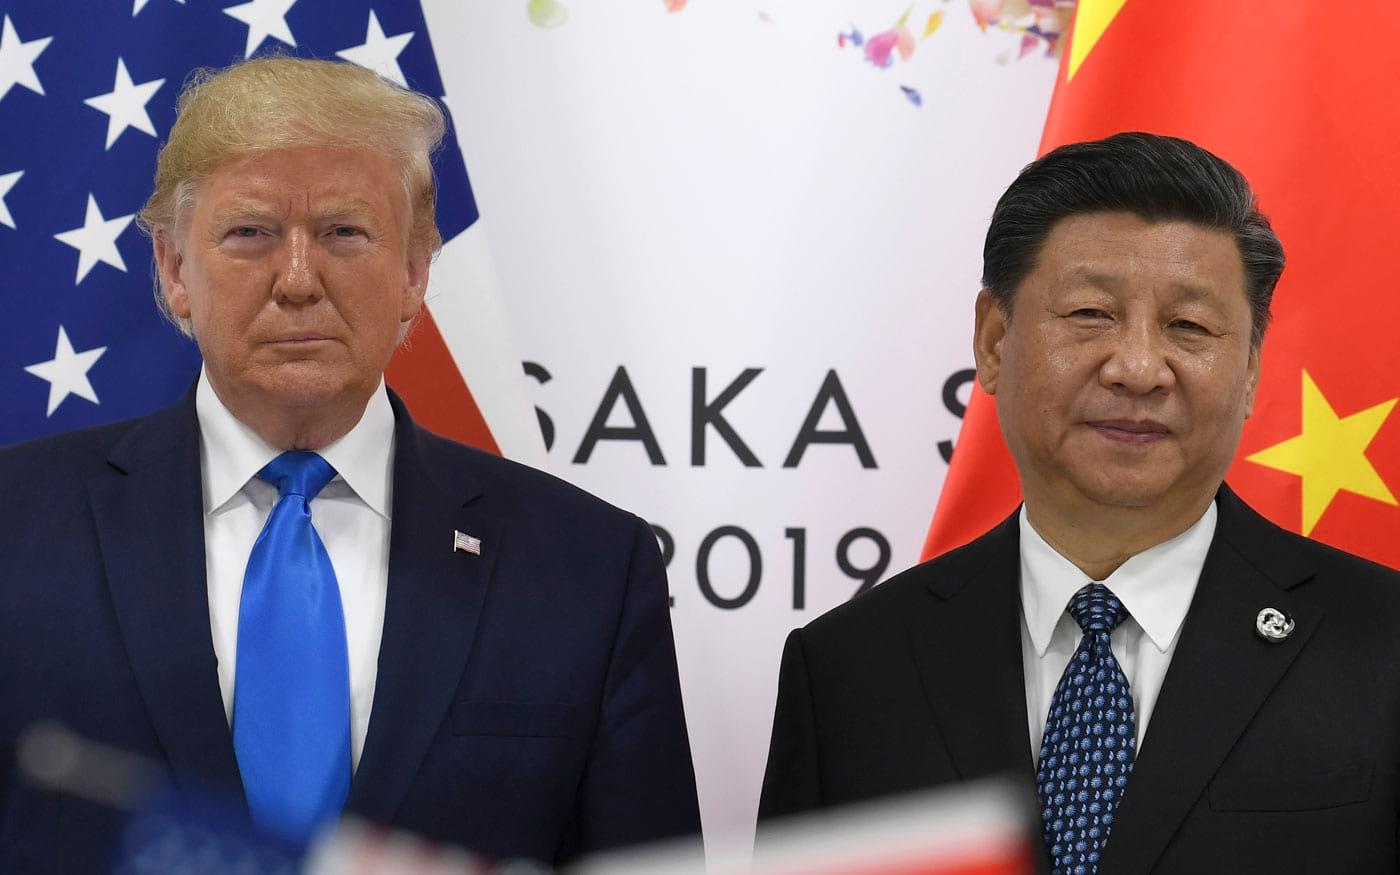 Donald Trump com presidente chinês Xi Jinping durante o G20. Foto: Times